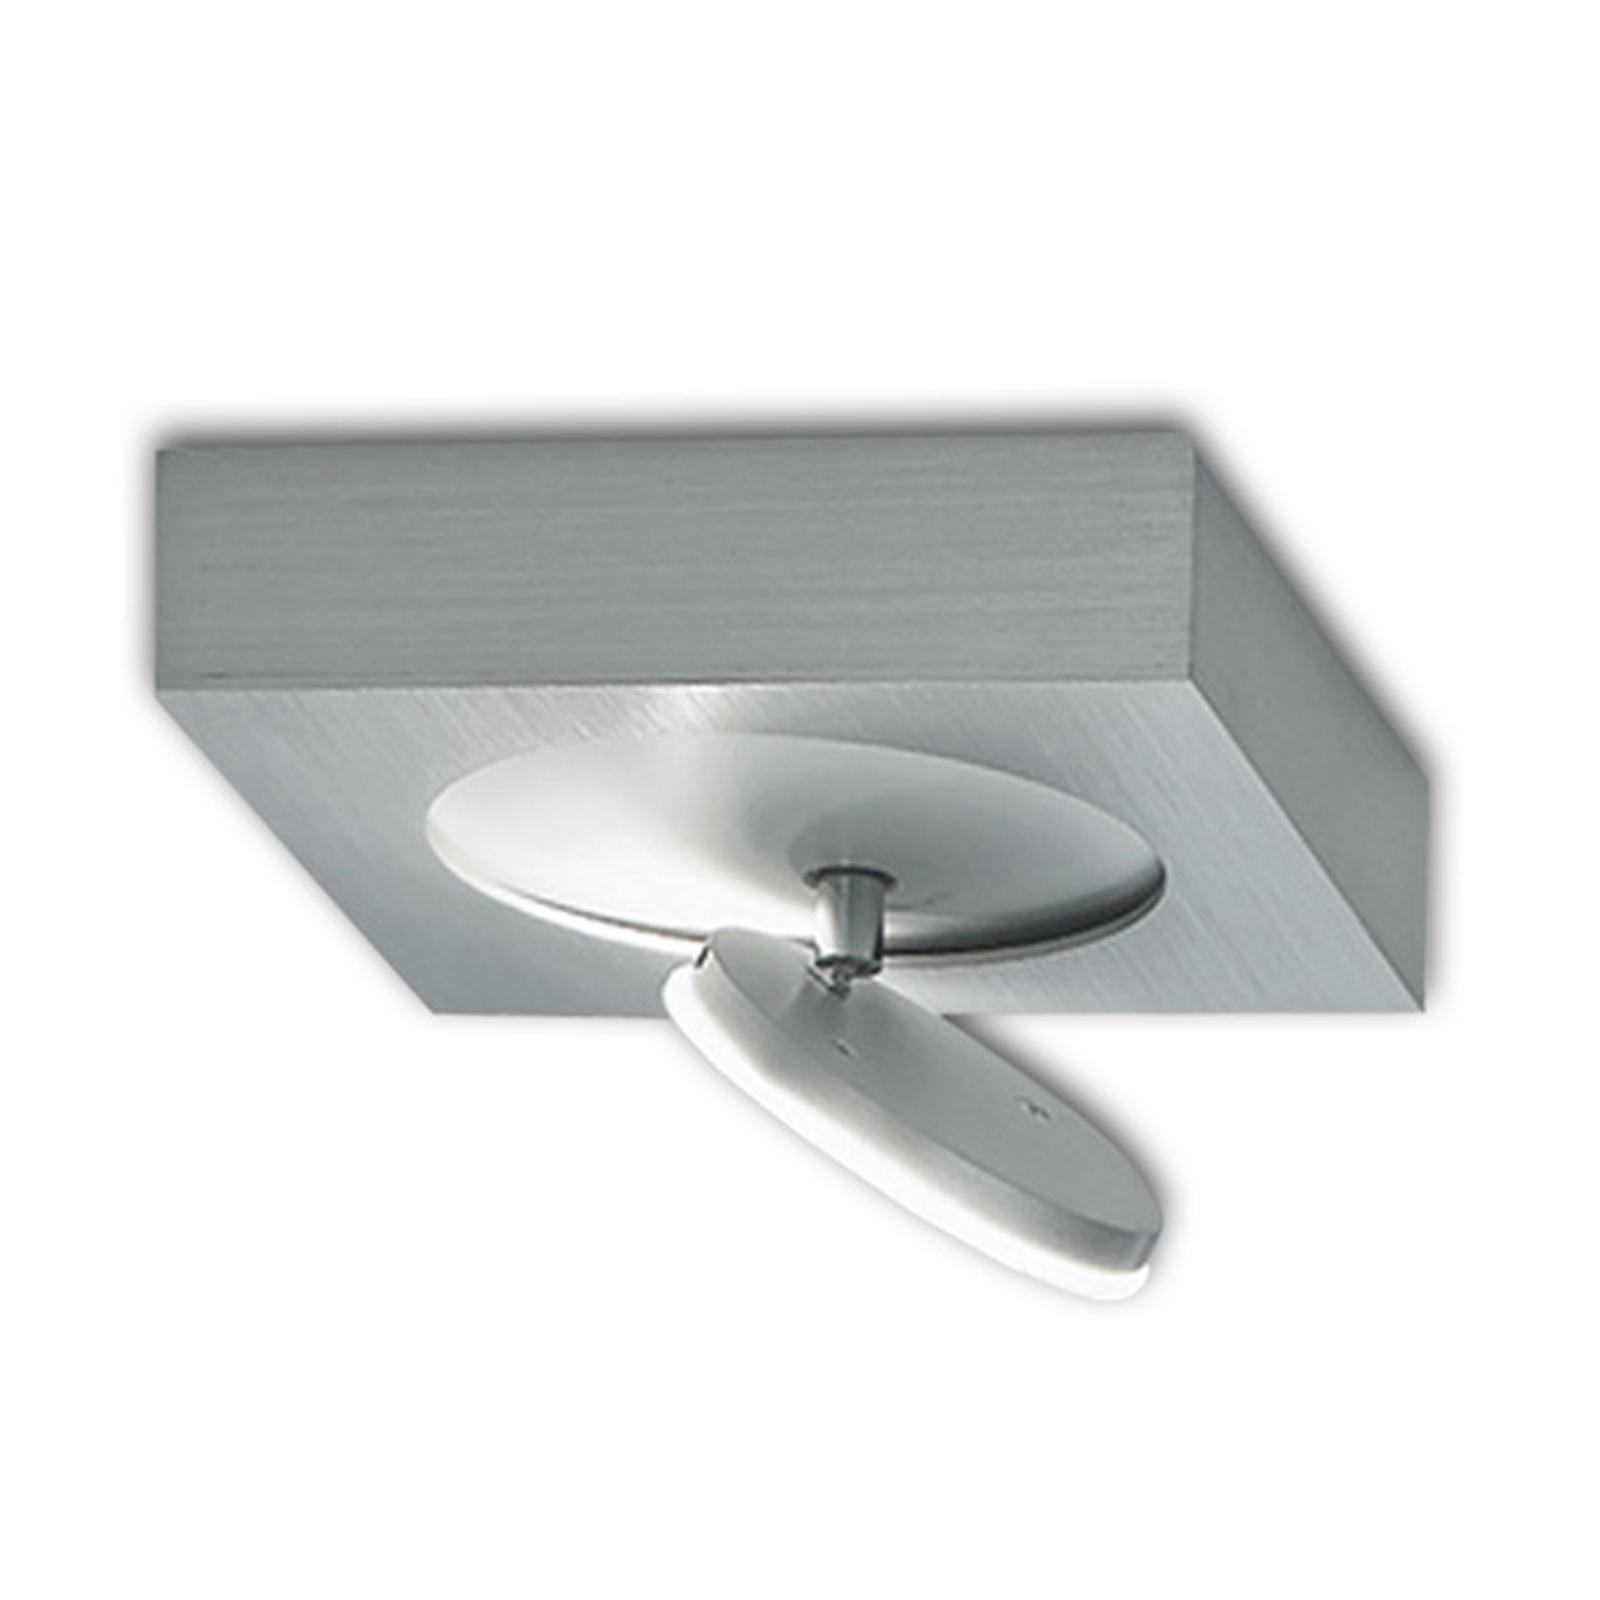 Lampa sufitowa Spot It z LED